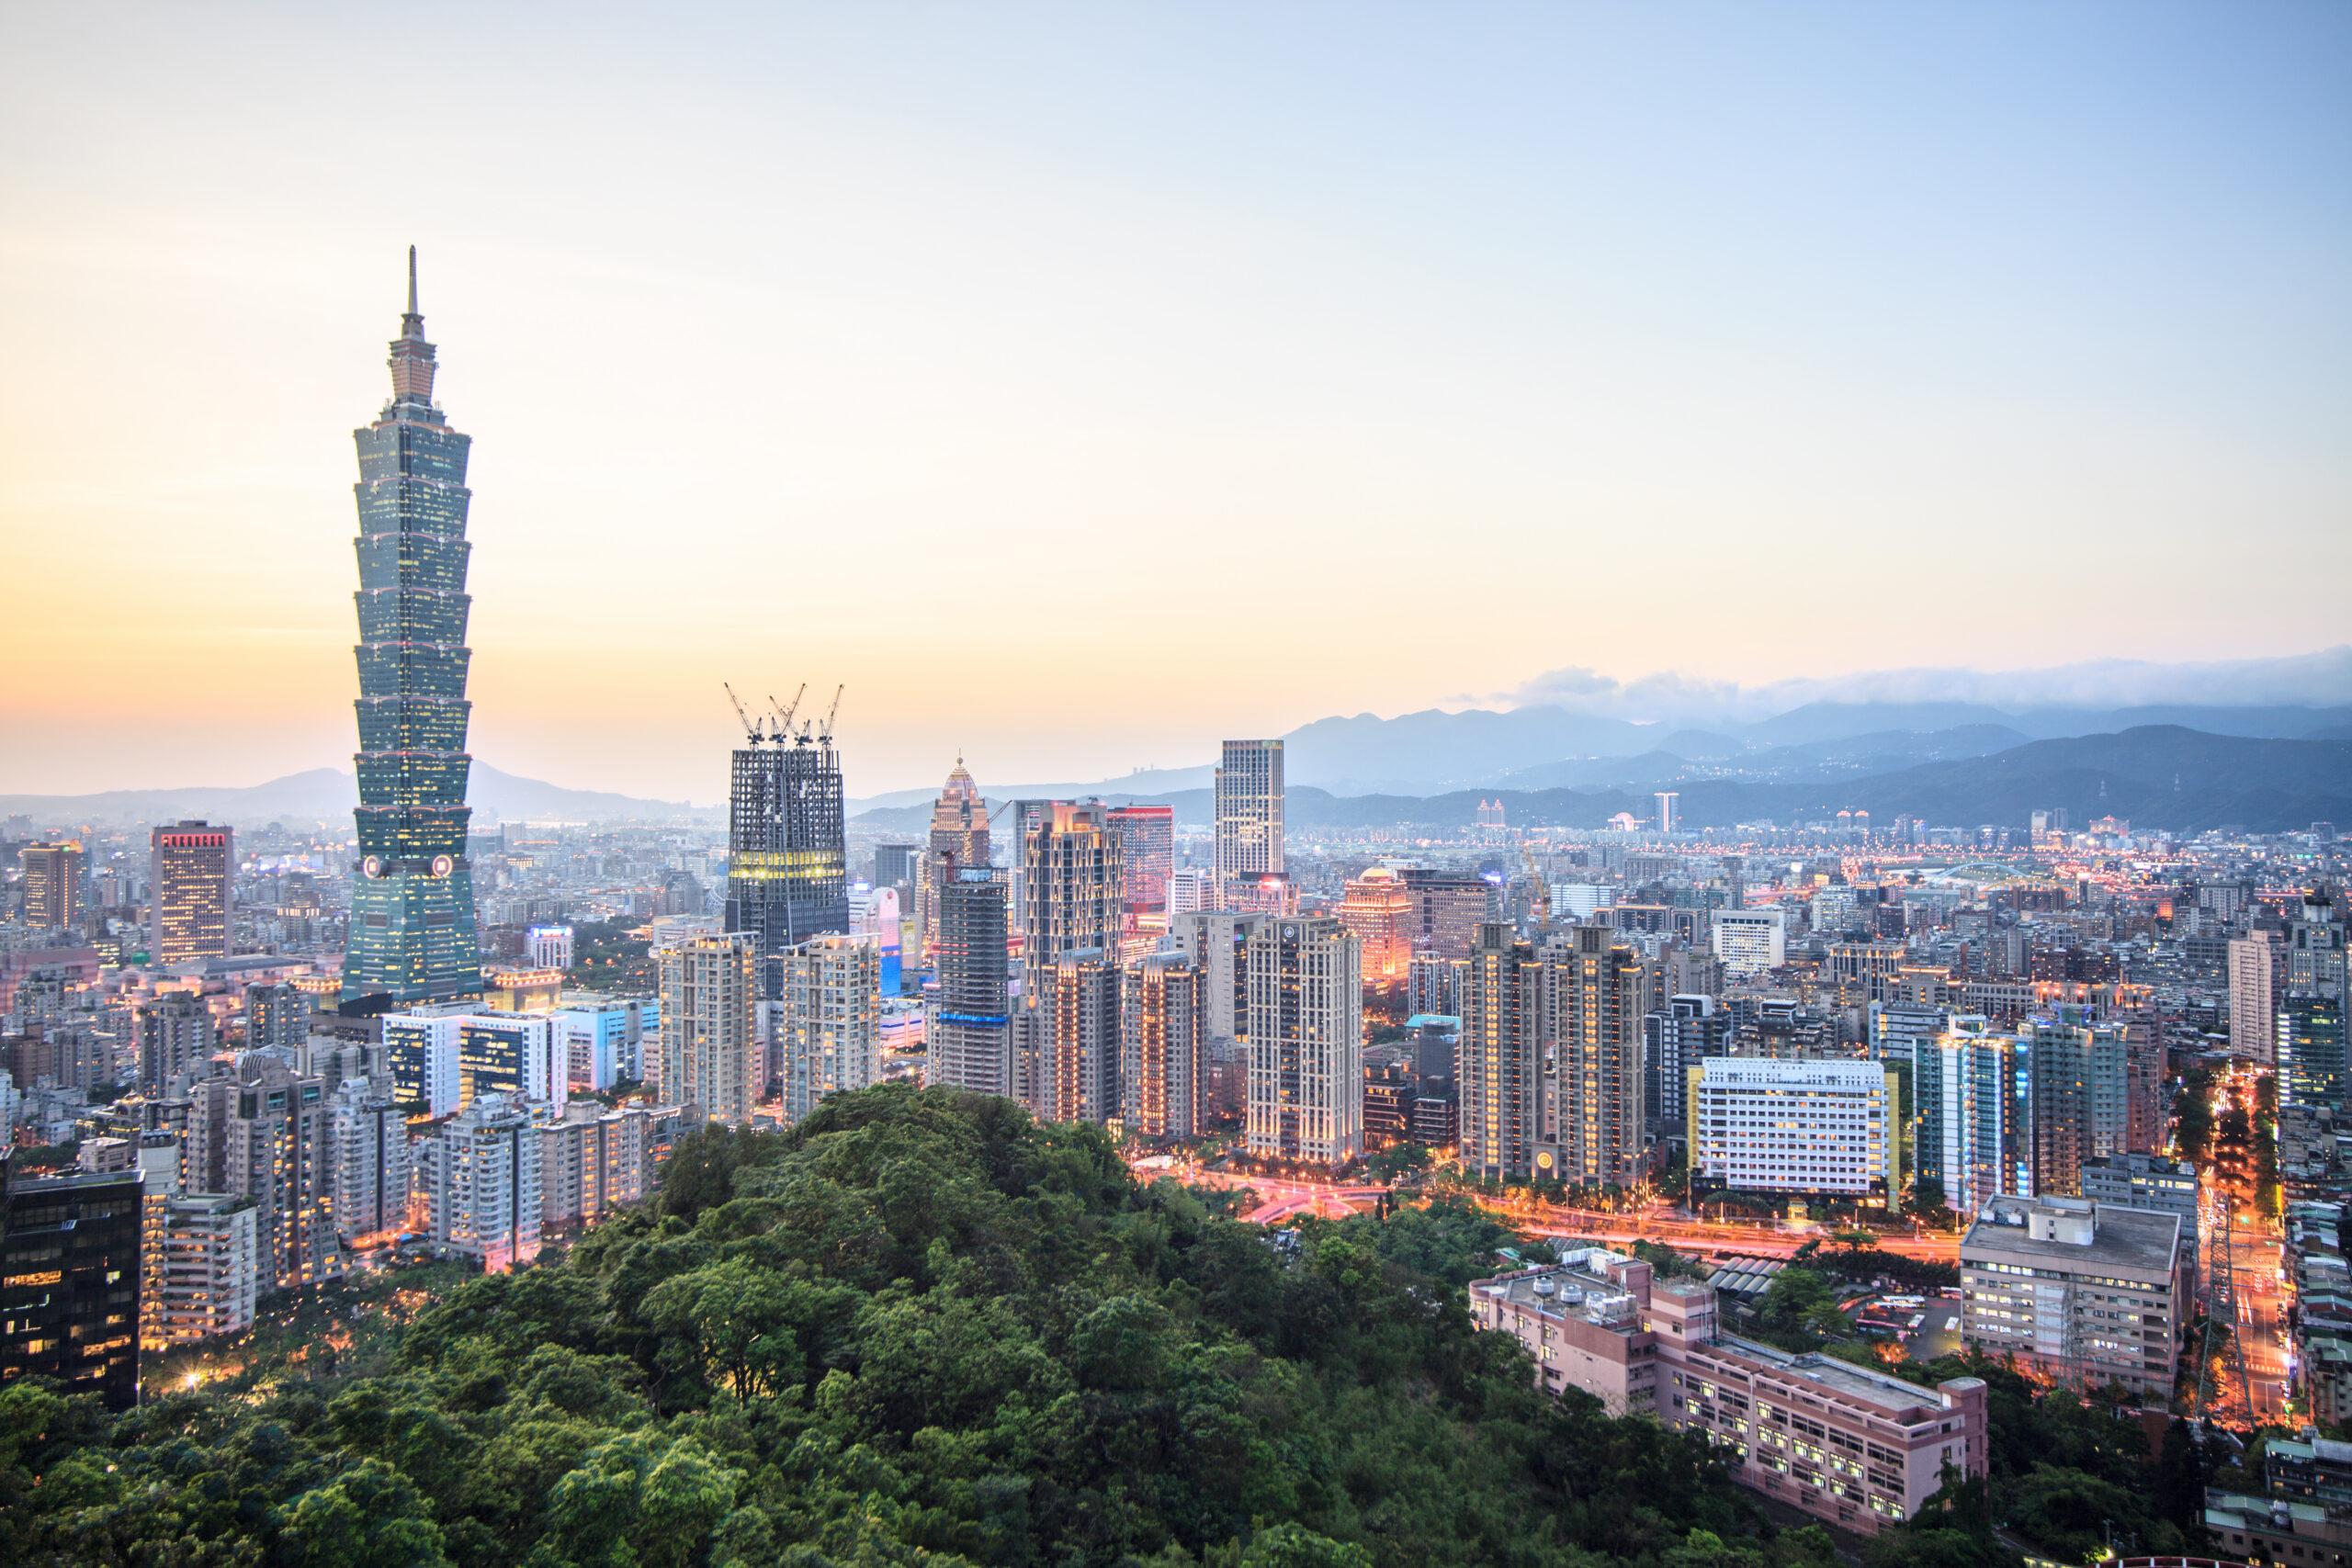 Skyline of Taiwan